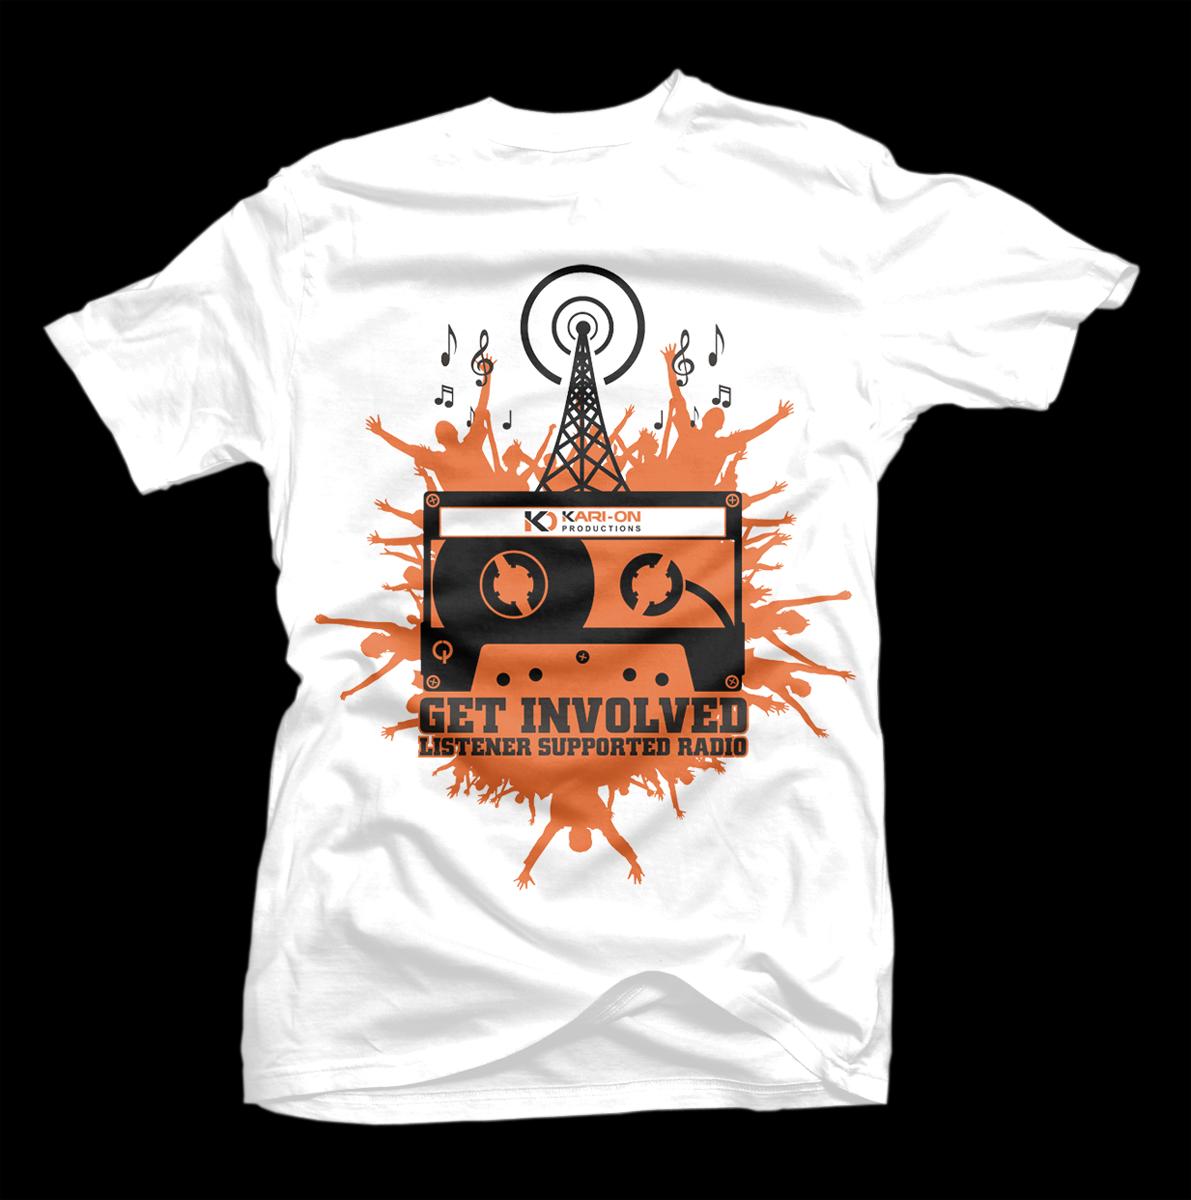 Tshirt design - Bold Upmarket Radio Tshirt Design By D Mono